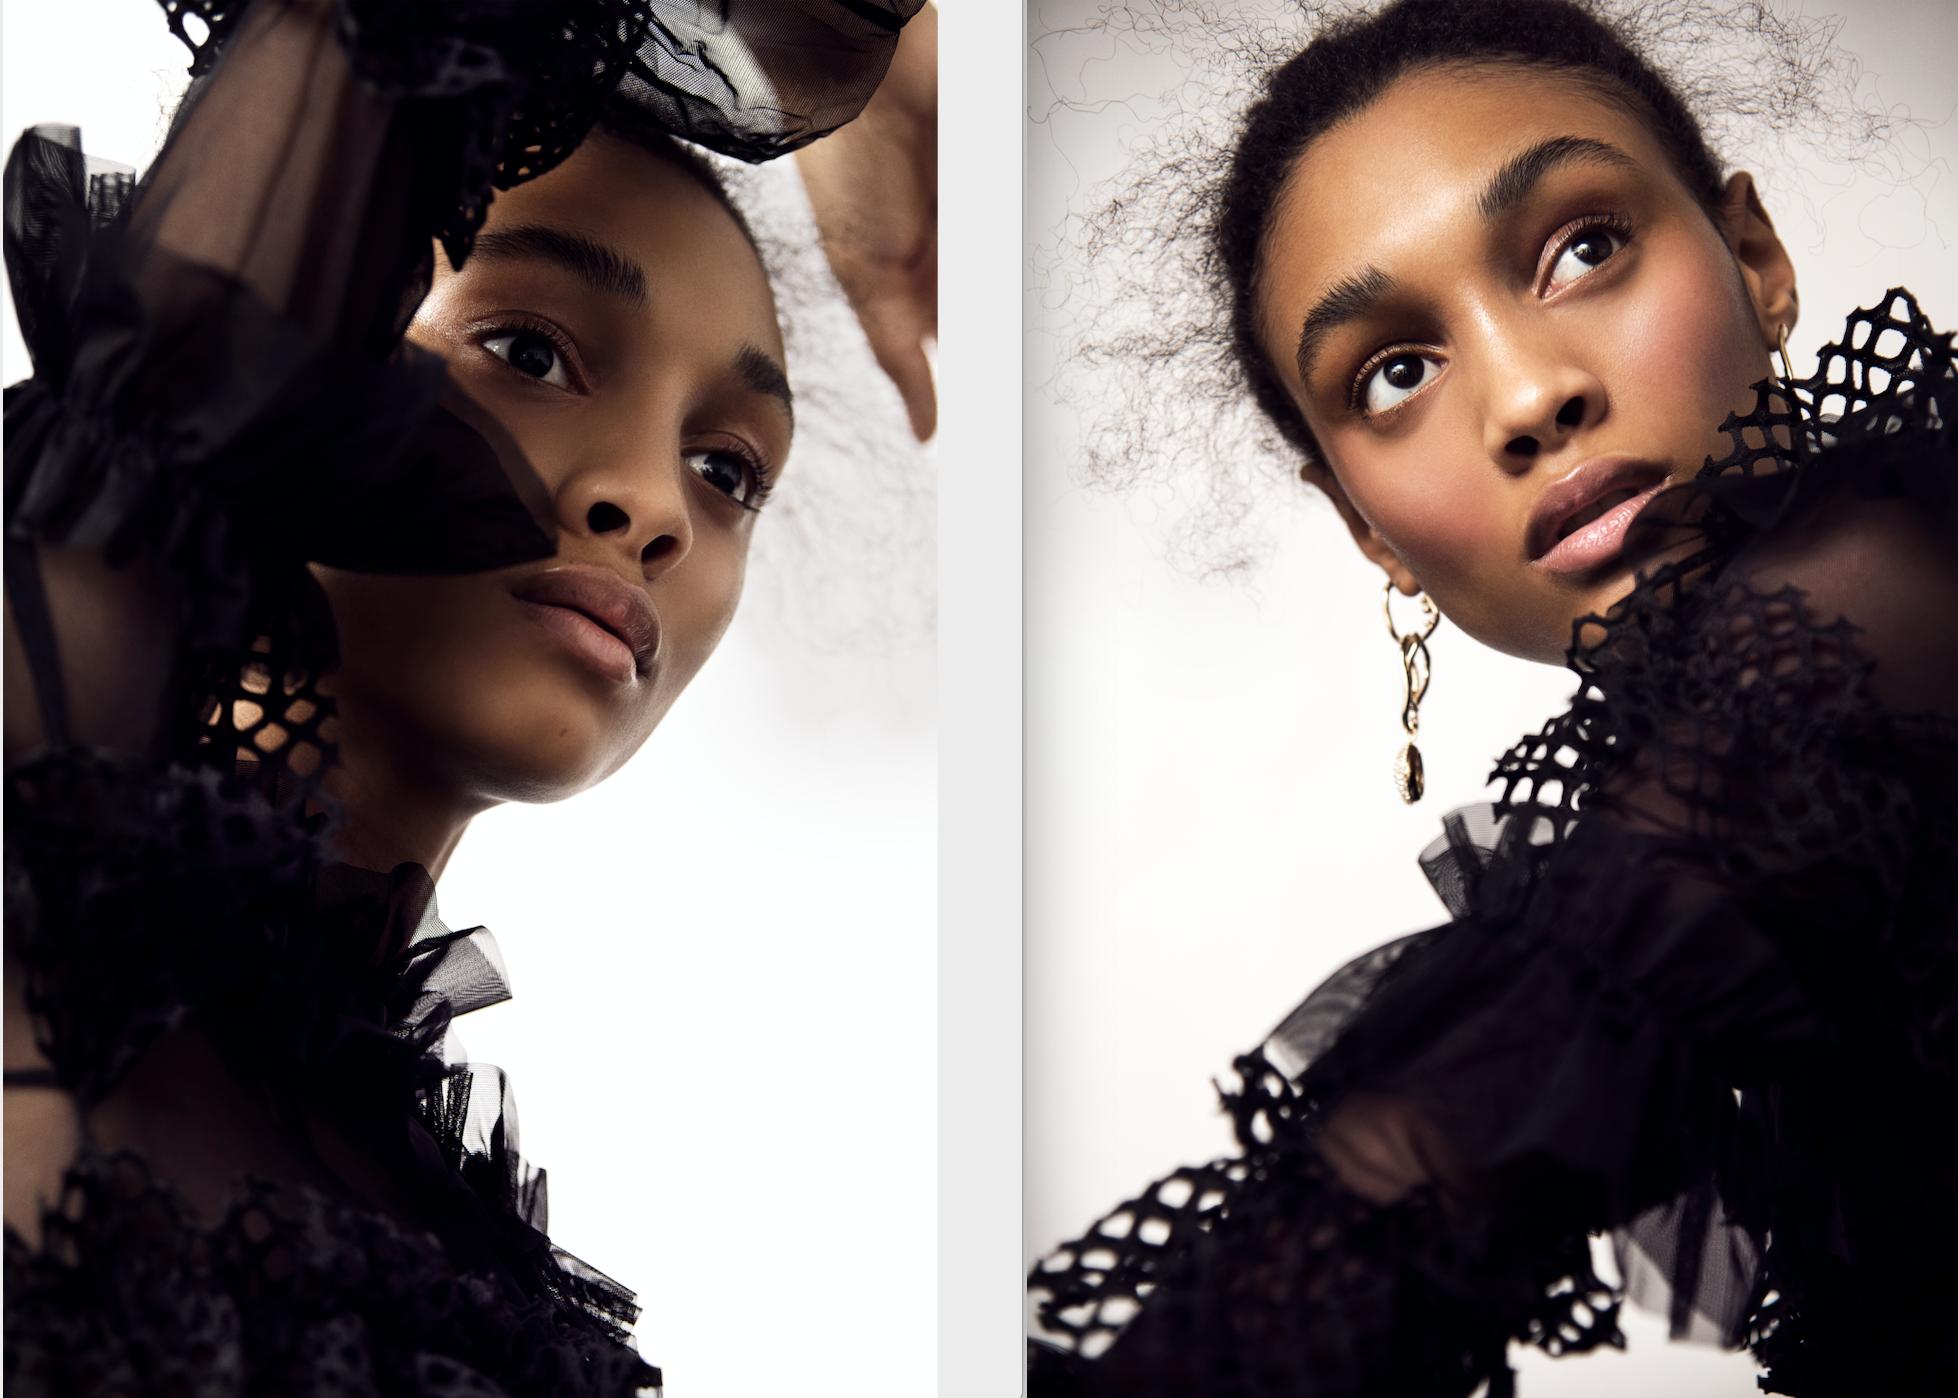 Hair, Nail, Make-up und Fashion styling portfolio / fabienne-pauli - paris-ludyvienka-styling-julia-fotografin-ellin-anderegg--ID540-1.png?v=1585734141